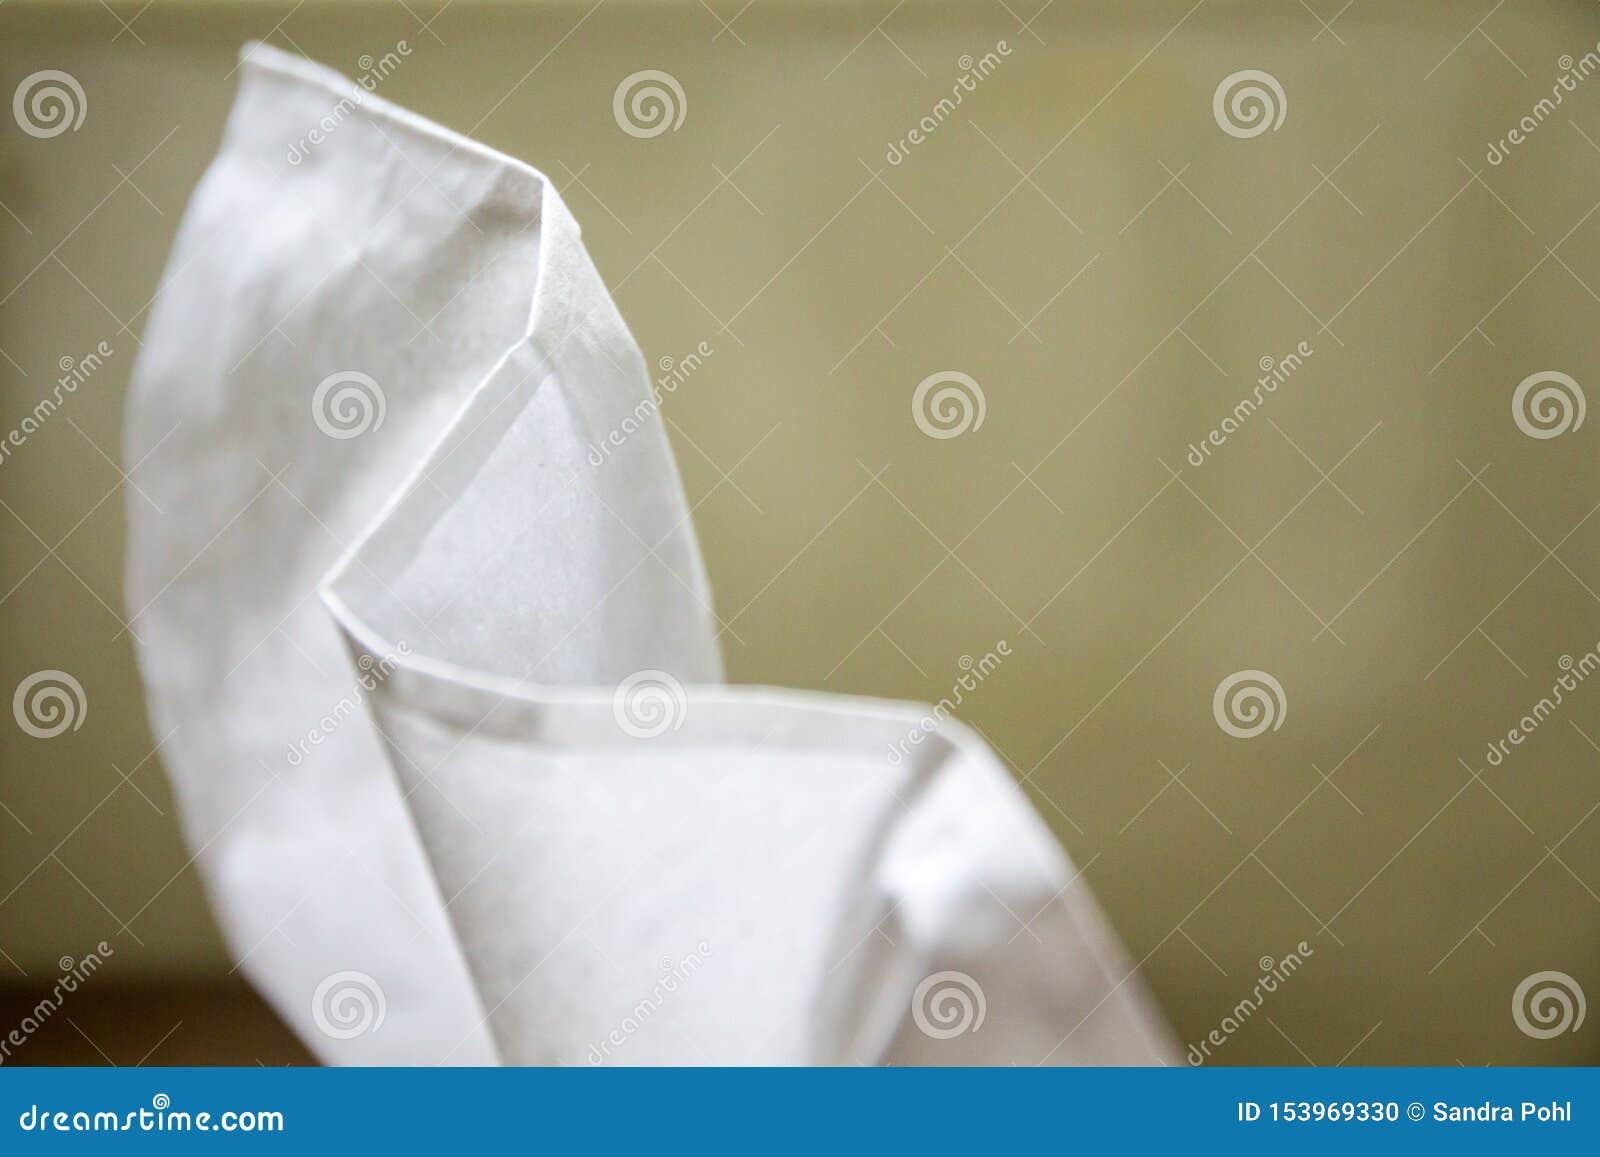 Towelette bianco su fondo verde